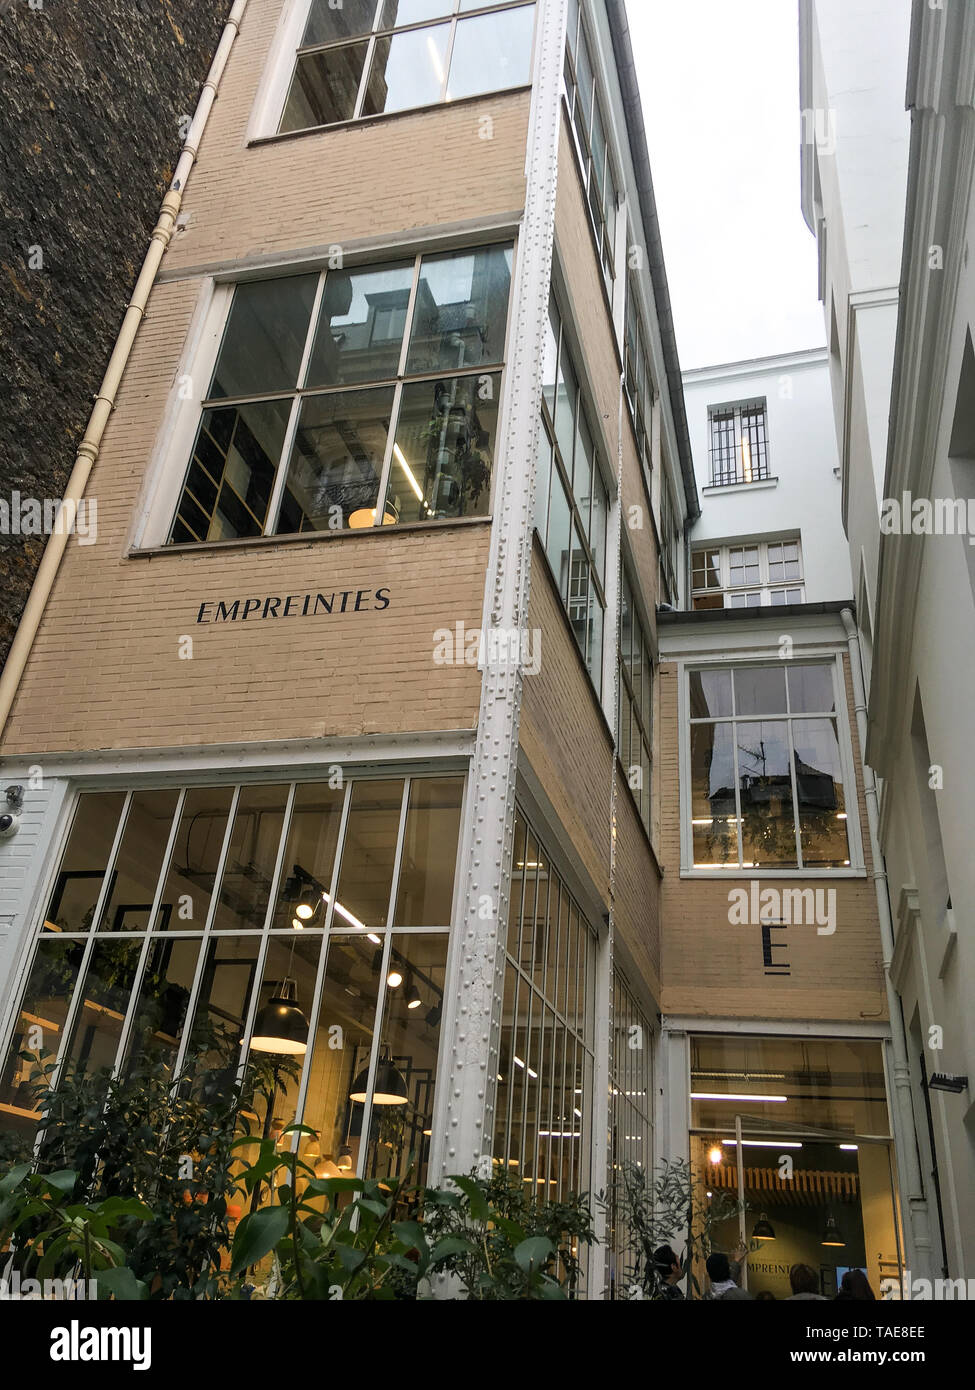 Empreintes, Concept store for arts & crafts professions, Paris, France - Stock Image